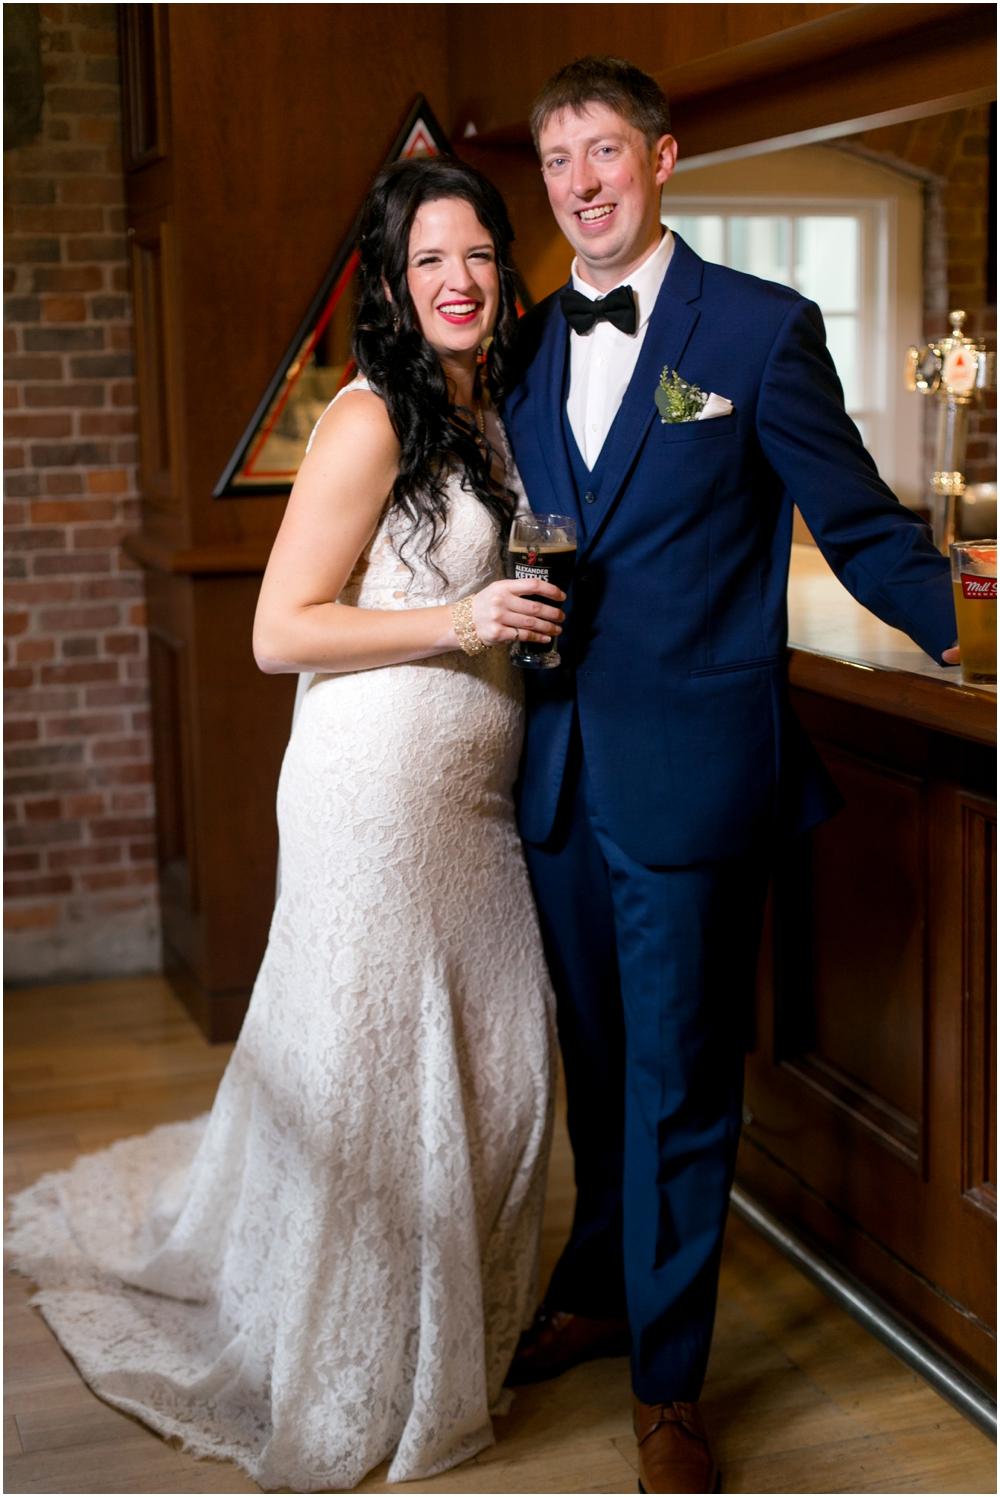 Keith's-Brewery-Wedding-Chantal-Ruthier-Photography_0014.jpg